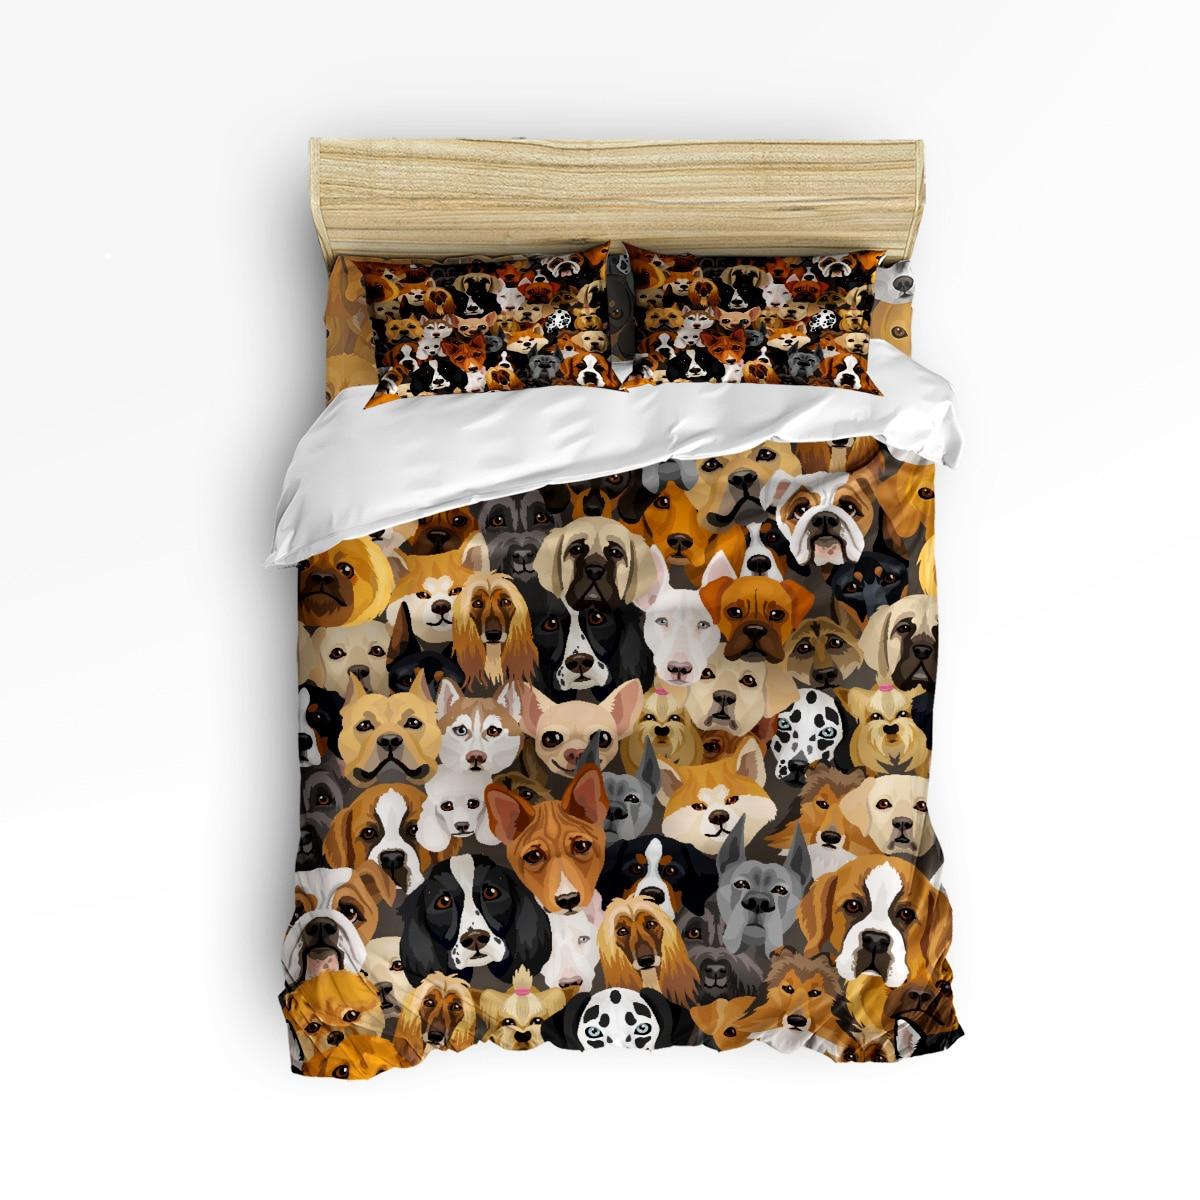 Arts 3d Cartoon Bulldog Hound 3 Pcs 4 Pcs Bedding Set Home Decor Duvet Dog Lover Comforter Bedding Sets Adult Kids Free ShippingArts 3d Cartoon Bulldog Hound 3 Pcs 4 Pcs Bedding Set Home Decor Duvet Dog Lover Comforter Bedding Sets Adult Kids Free Shipping